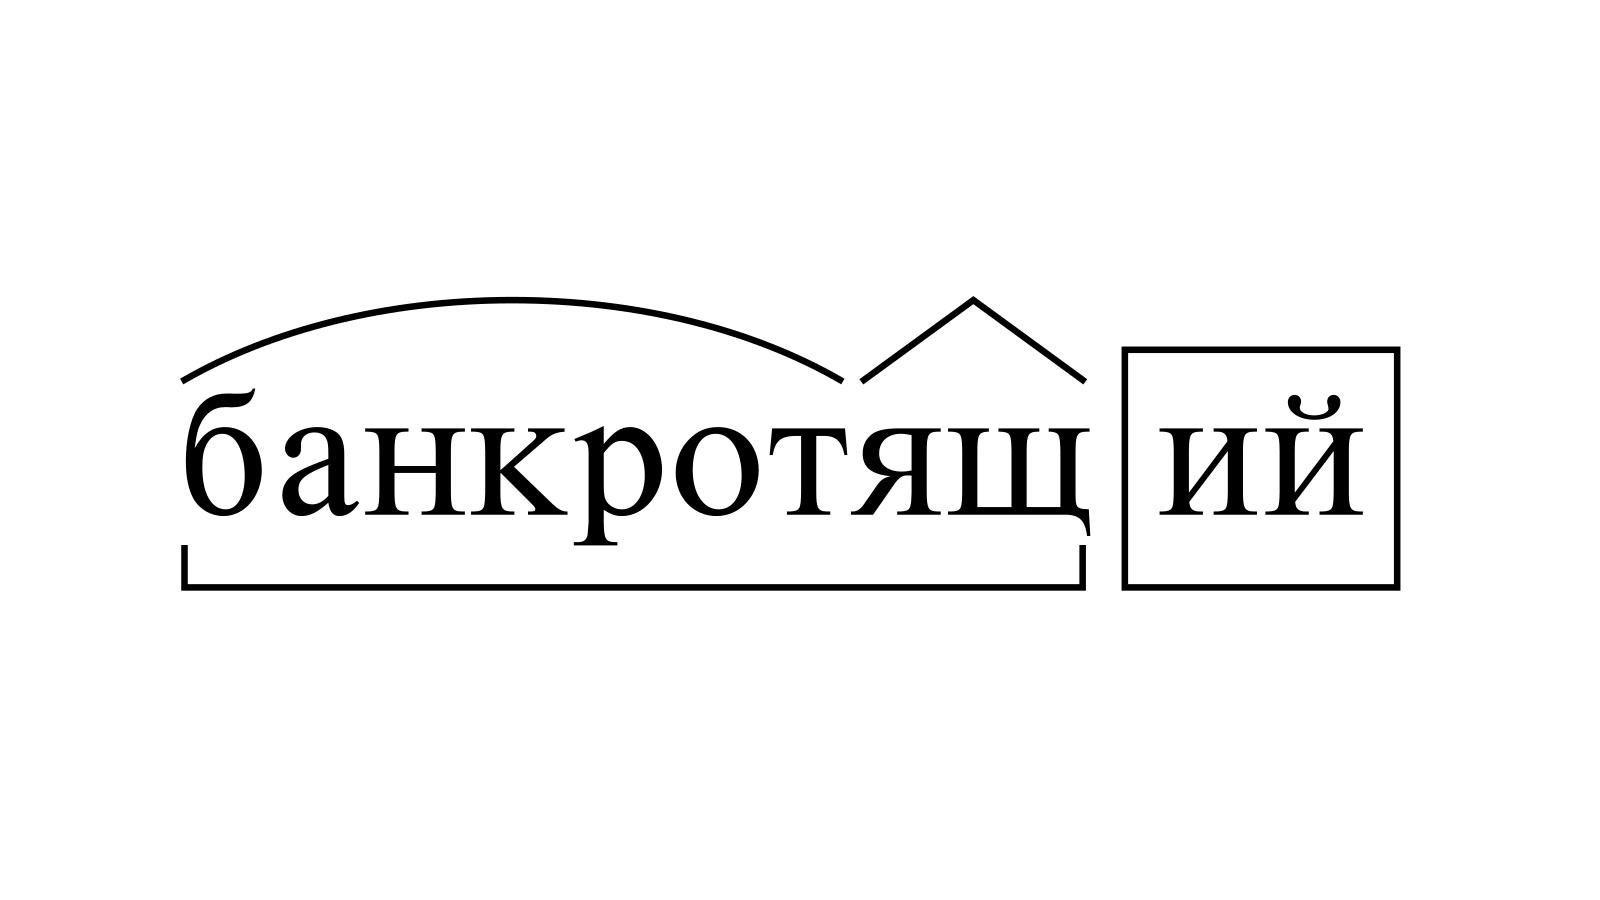 Разбор слова «банкротящий» по составу